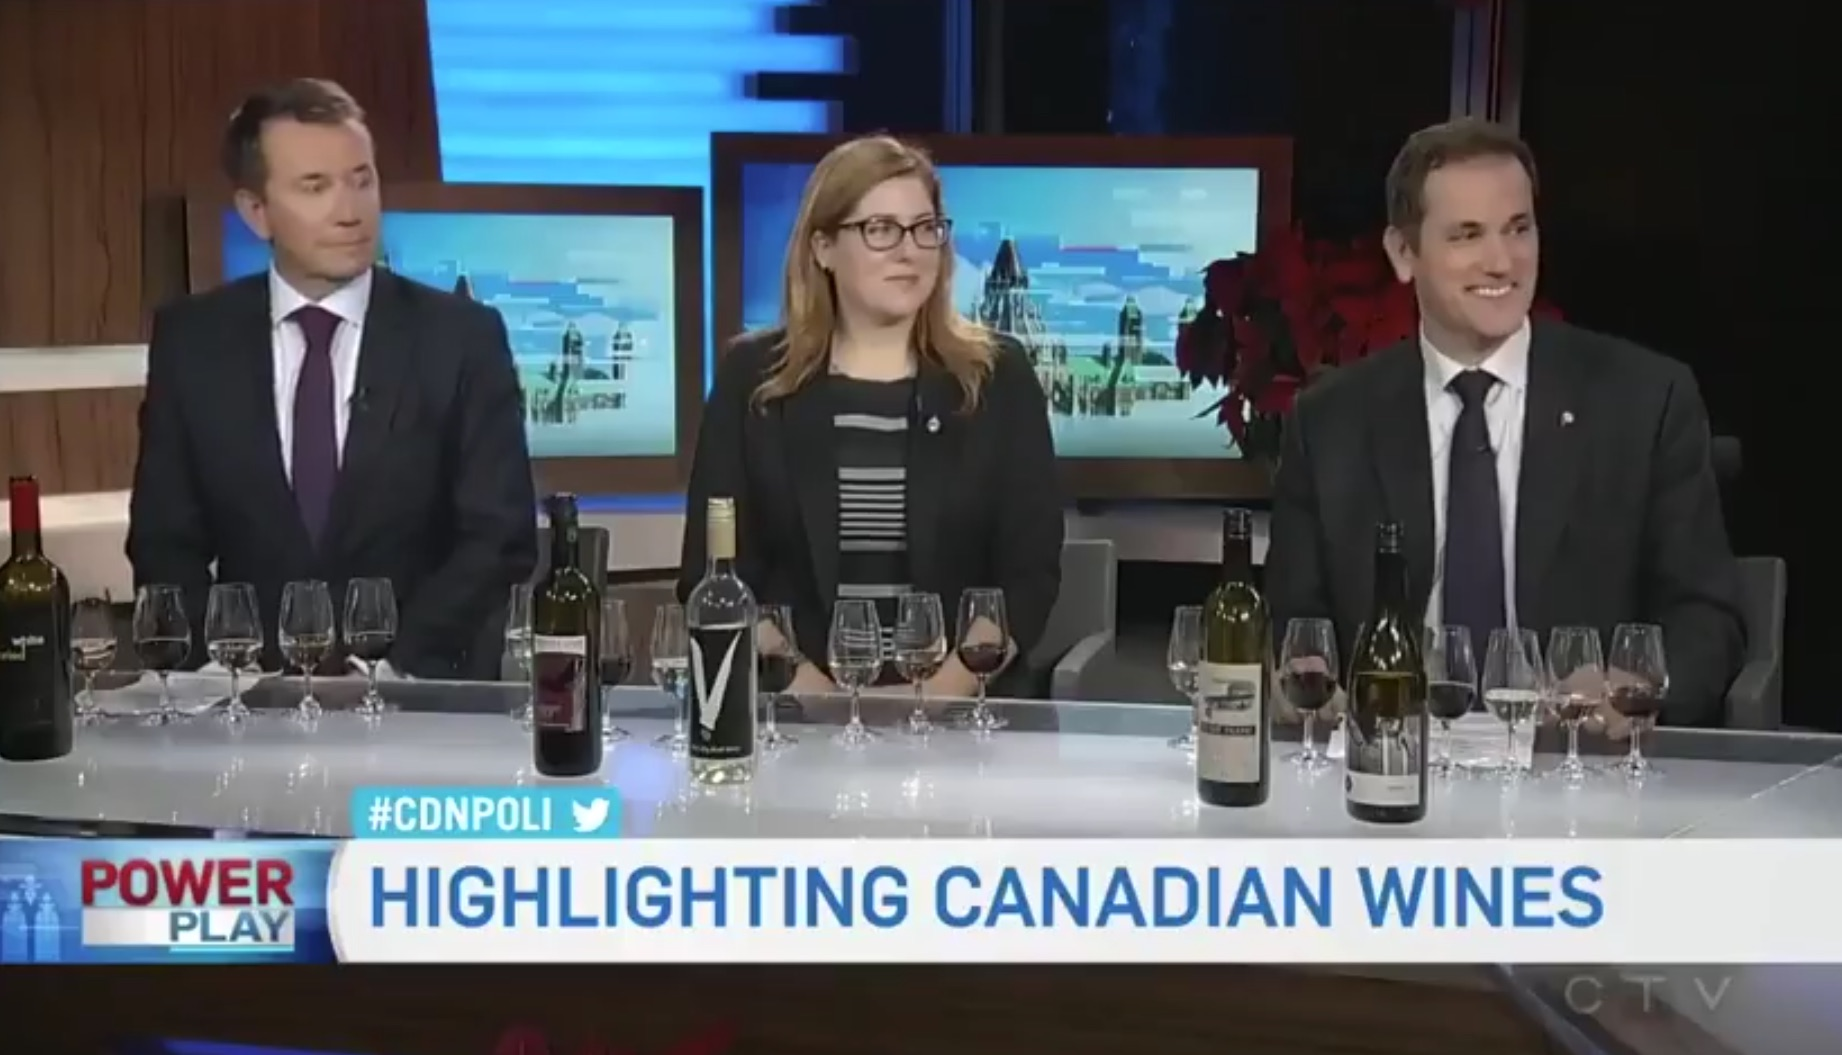 CTV Powerplay wine-panel